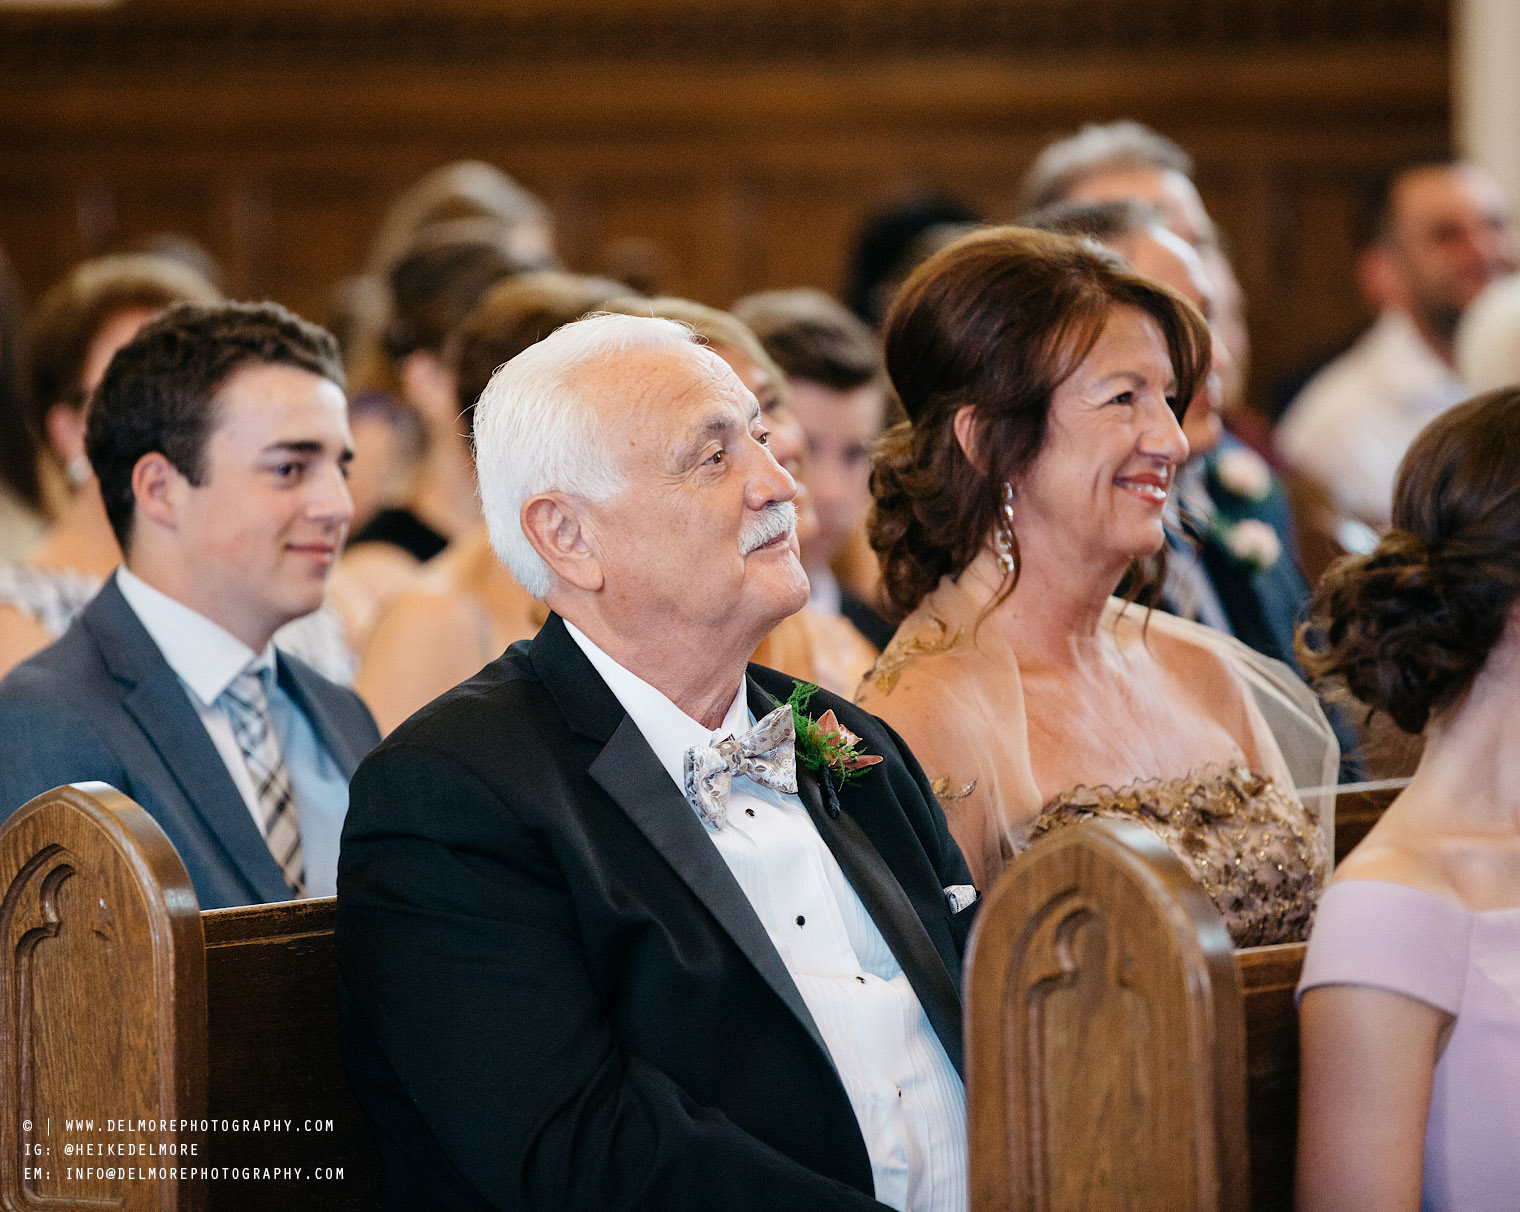 Windsor Wedding Photographers Candid Photos